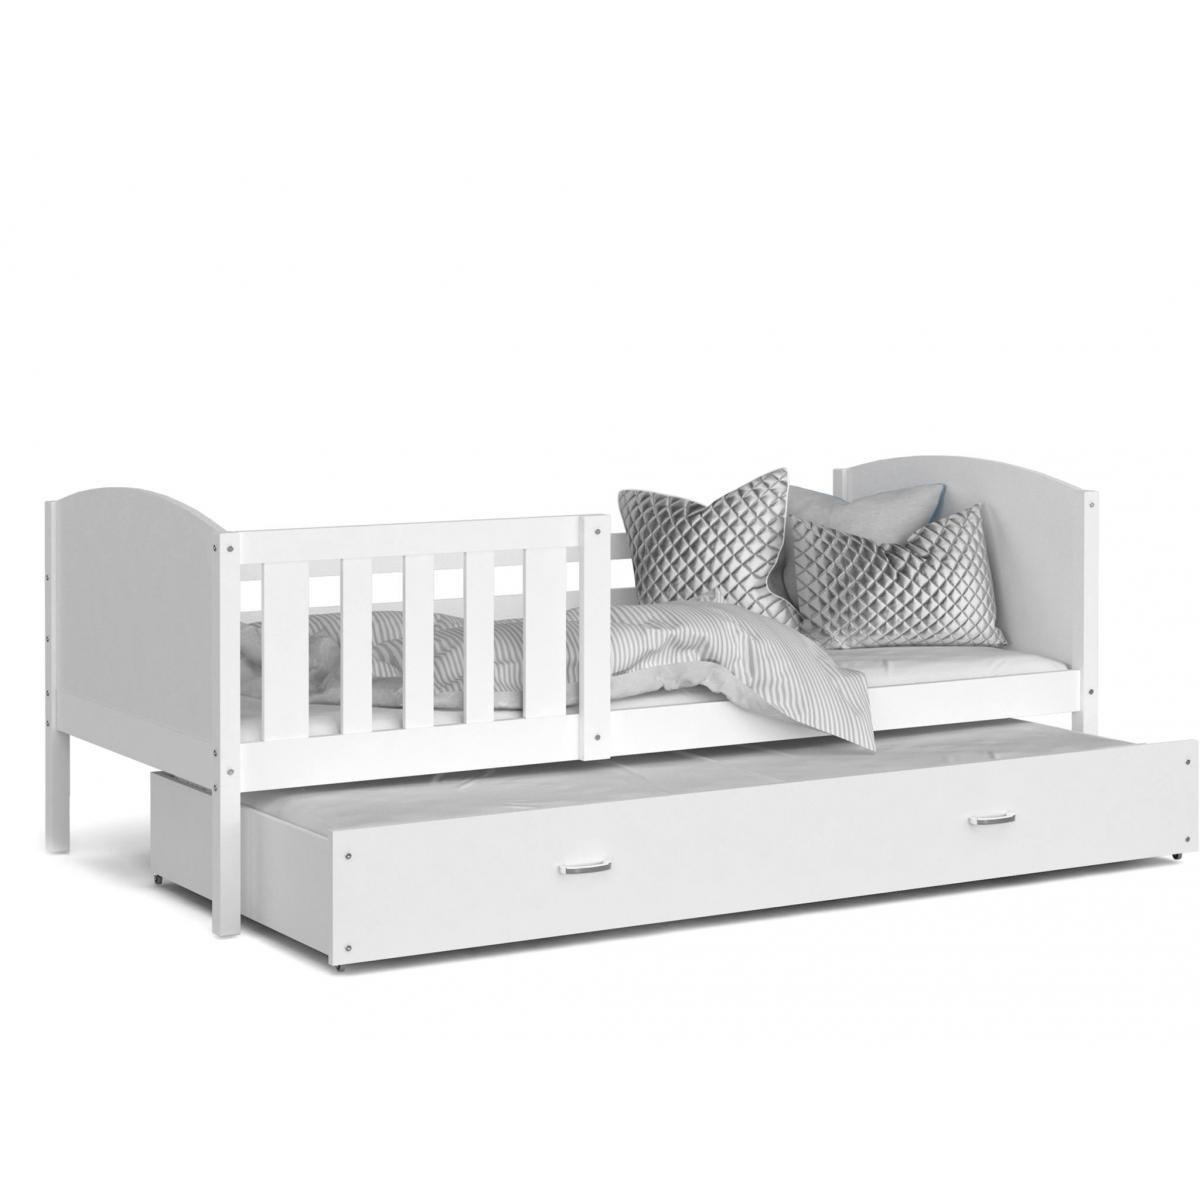 Kids Literie LIT Gigogne Tomy 90x190 Blanc - Blanc livré avec sommier, tiroir et matelas de 7cm OFFERT.